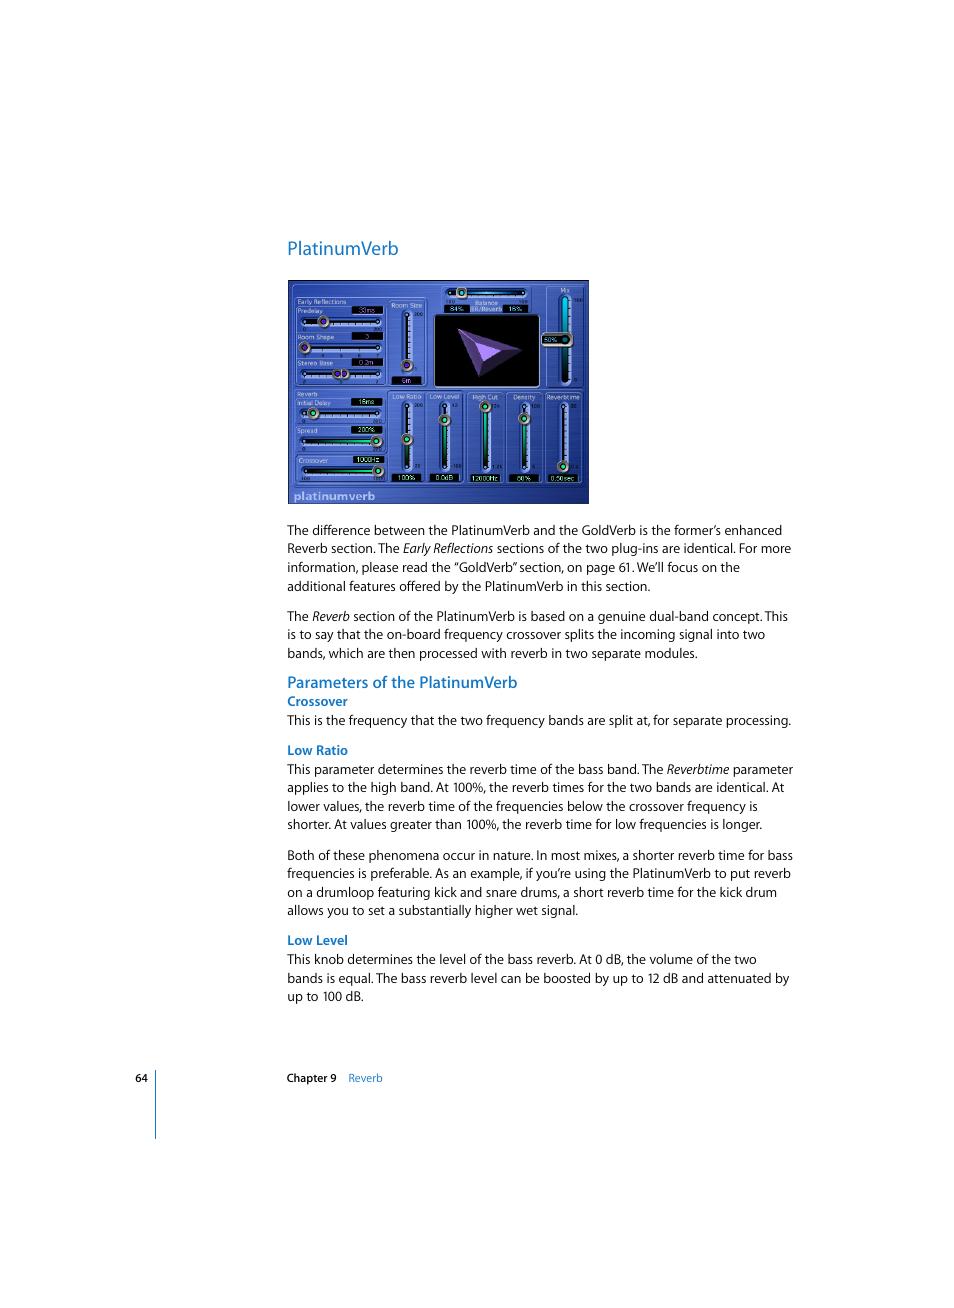 platinumverb parameters of the platinumverb crossover apple rh manualsdir com logic express 7 manual logic express manual pdf